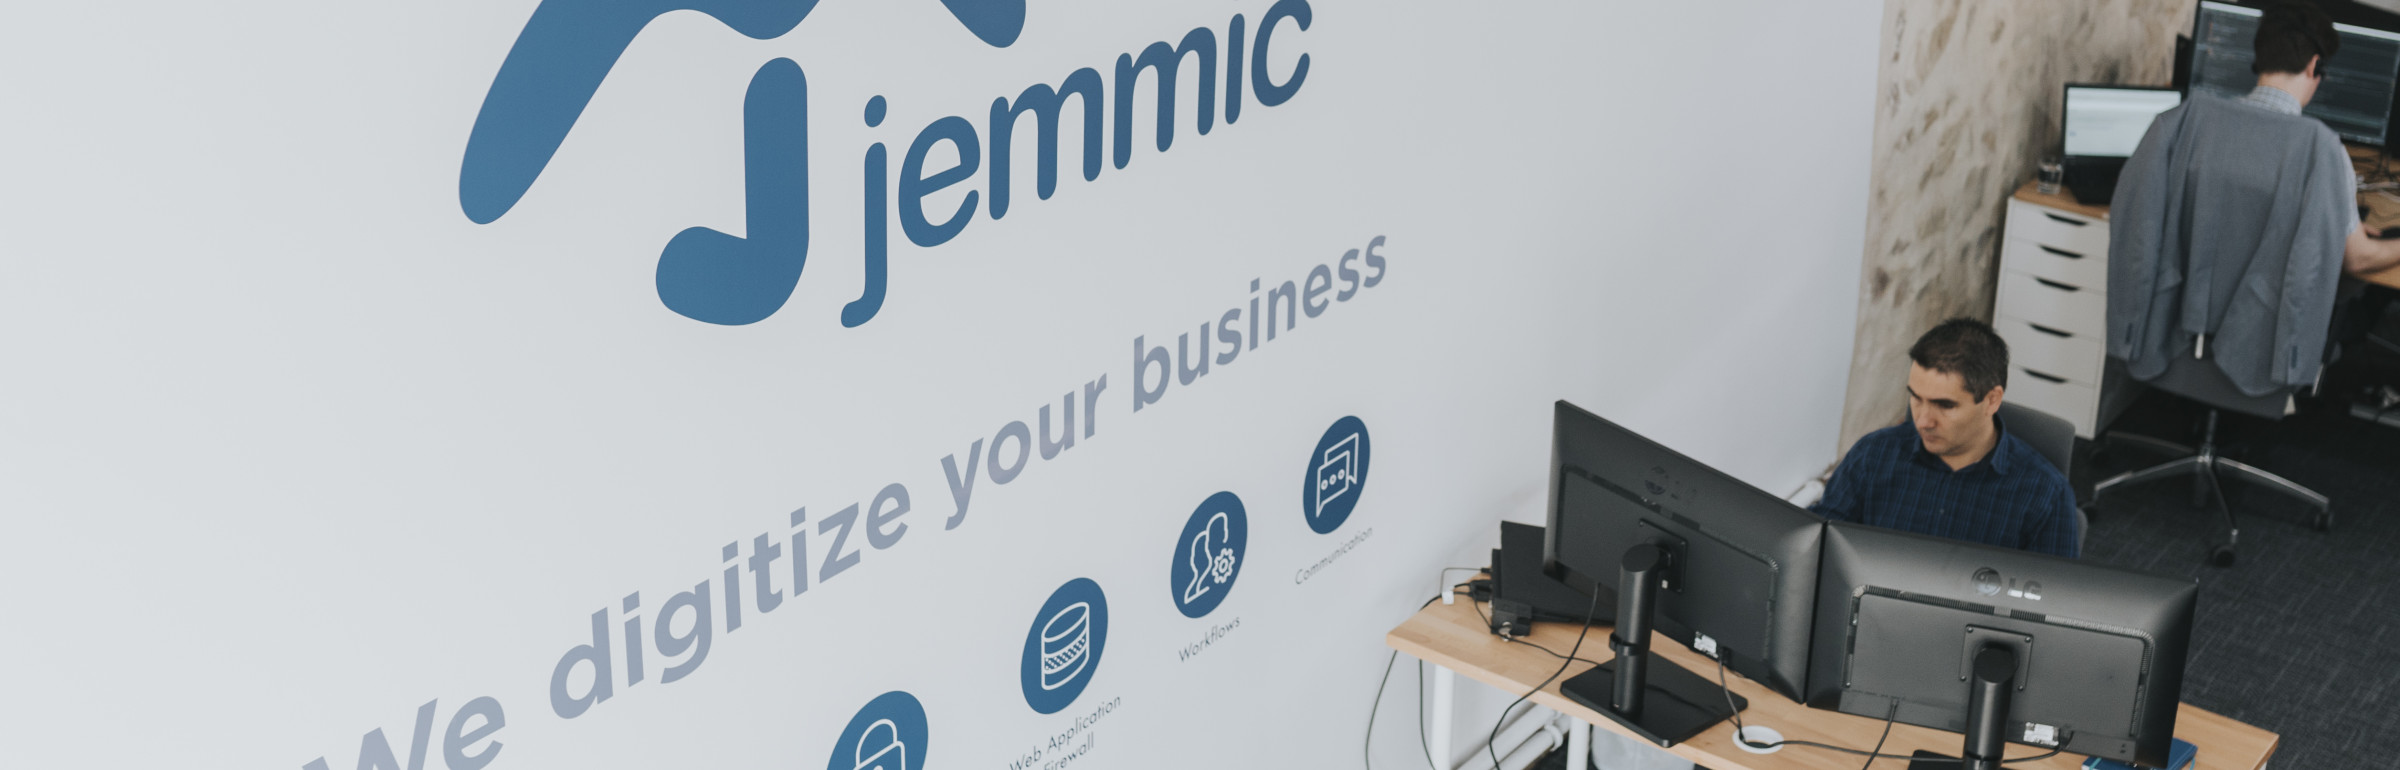 Banner Jemmic s.à r.l.